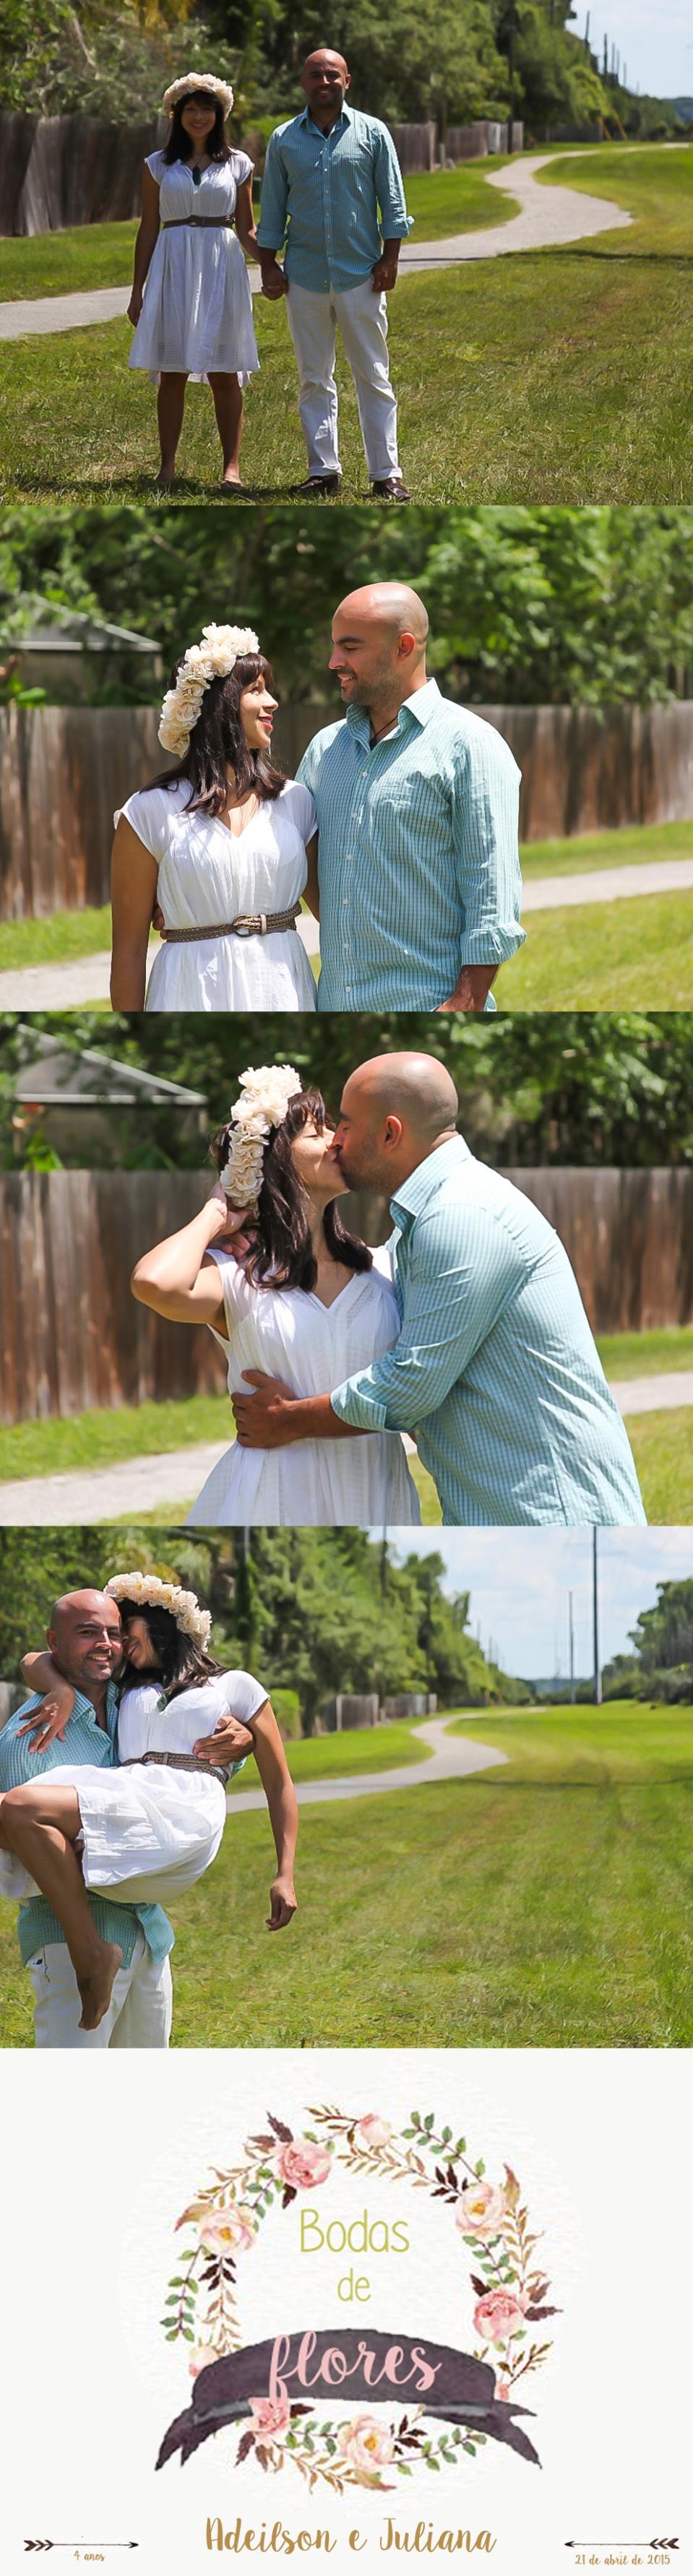 bodas de flores1